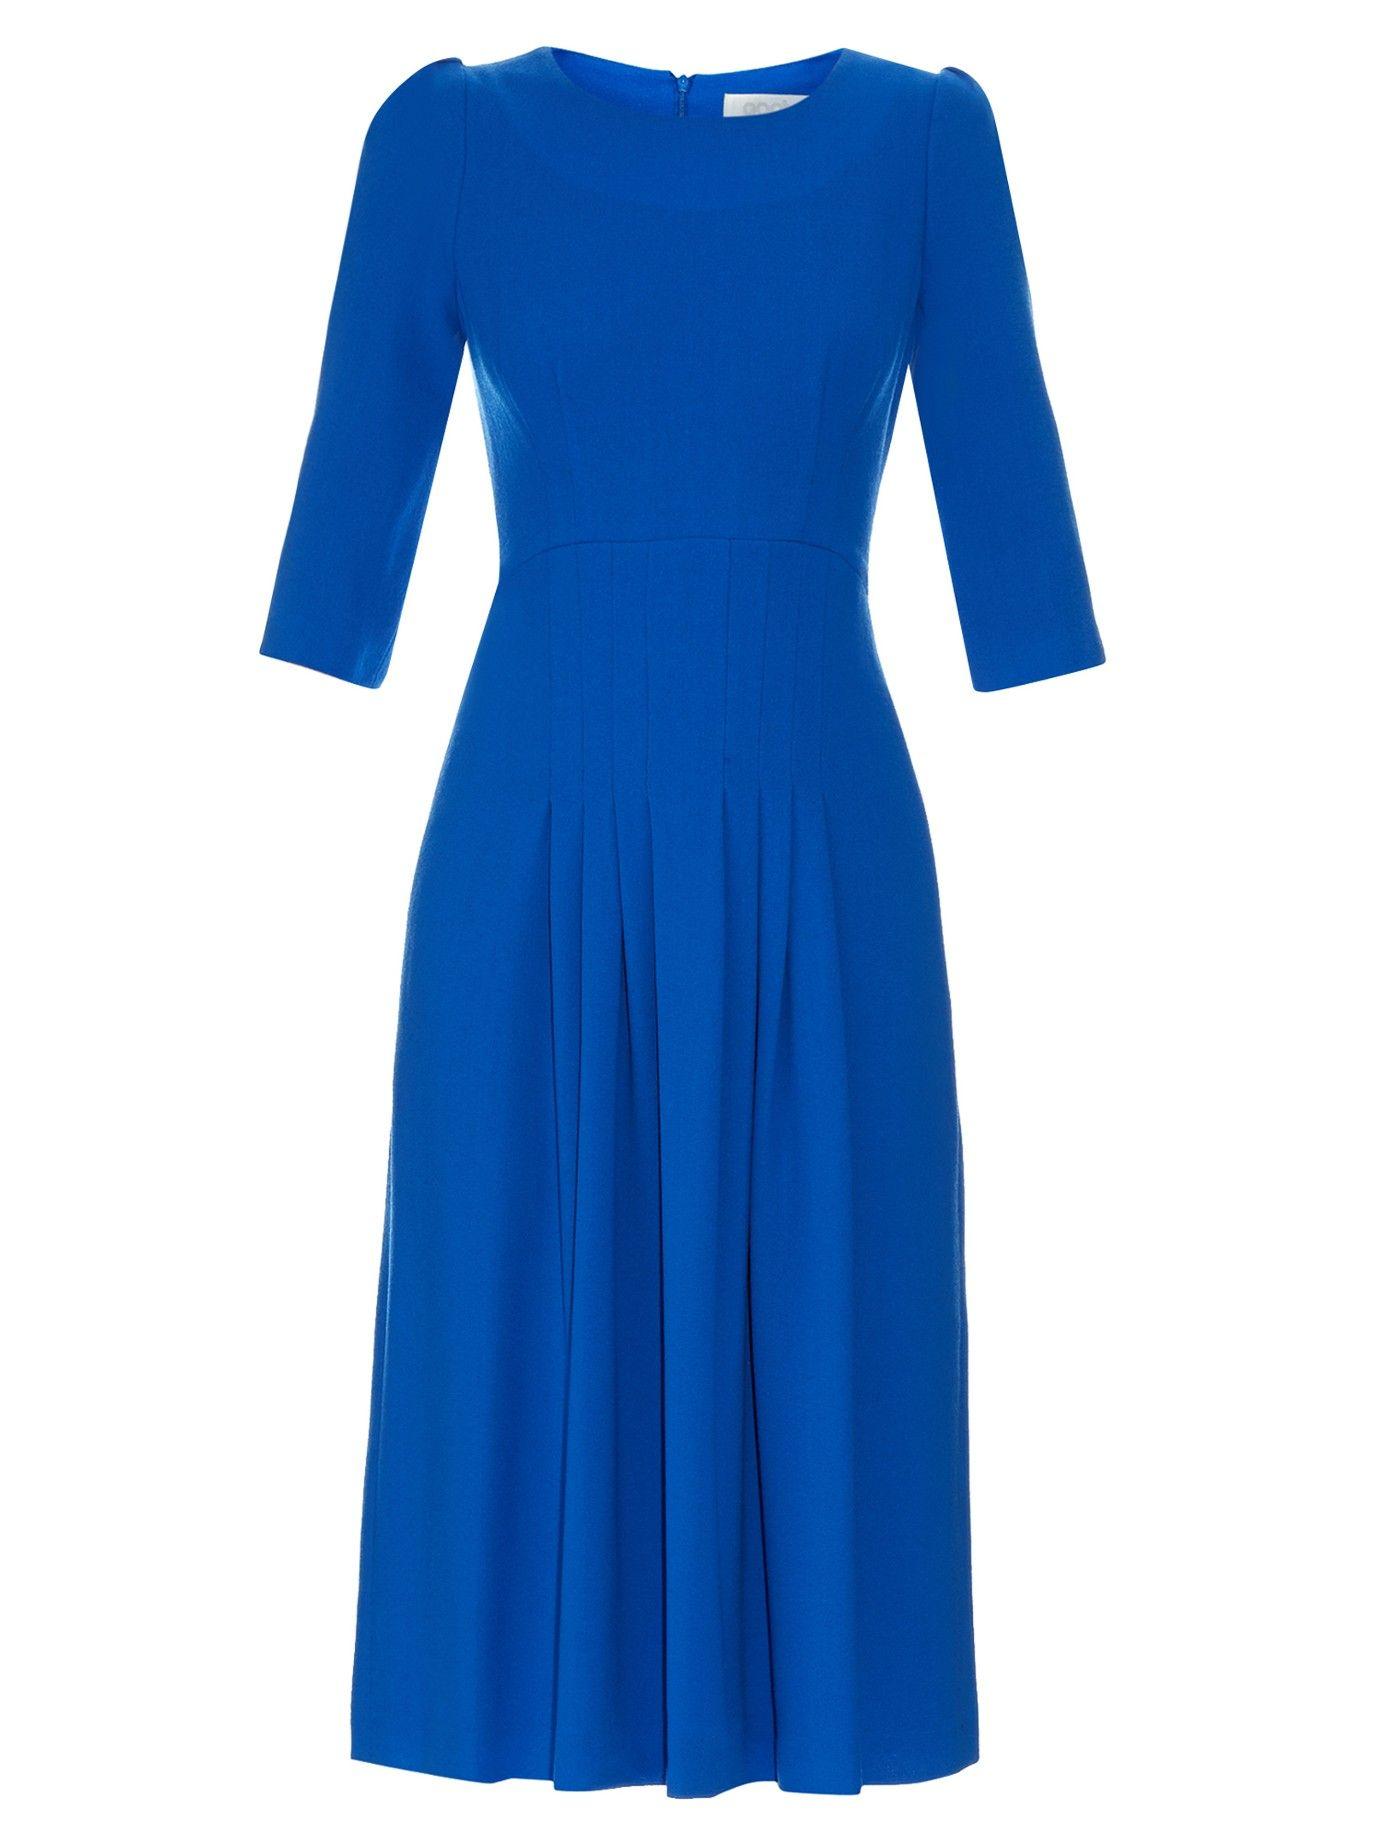 2d1bac4e2a3 Camelot wool-crepe dress